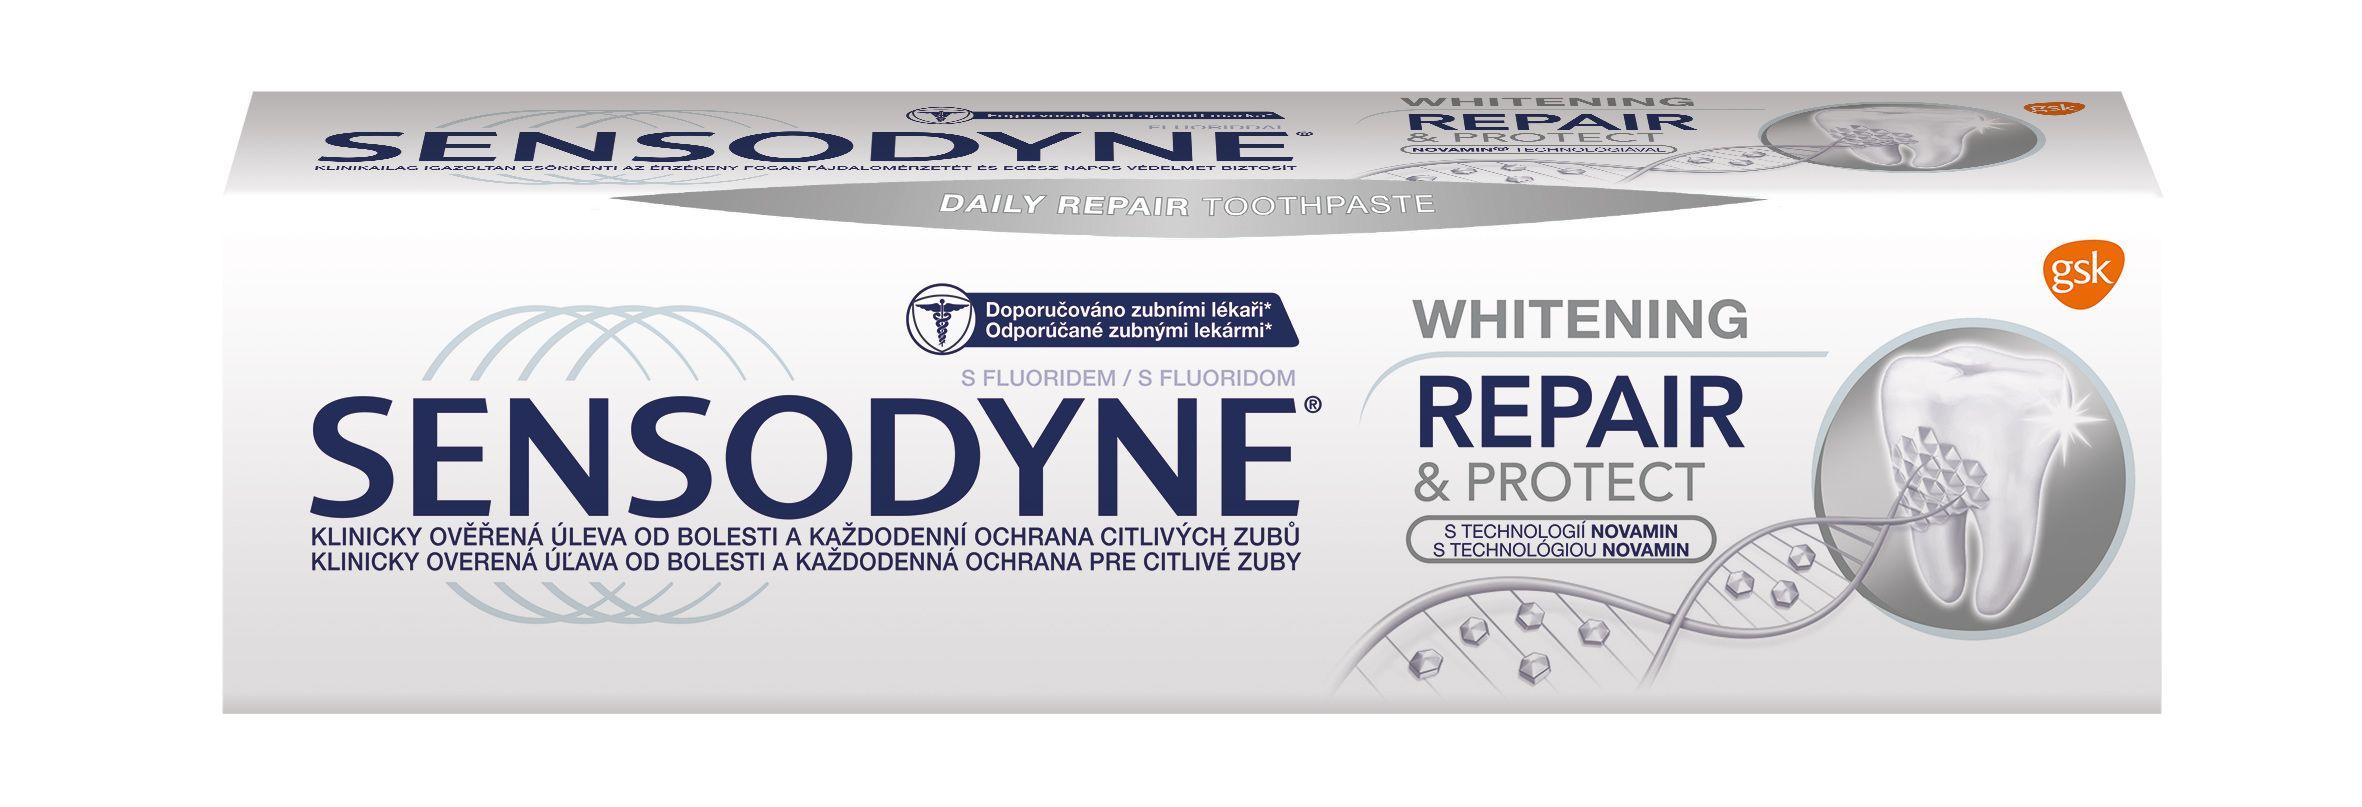 Sensodyne Repair & Protect Whitening zubní pasta 75 ml